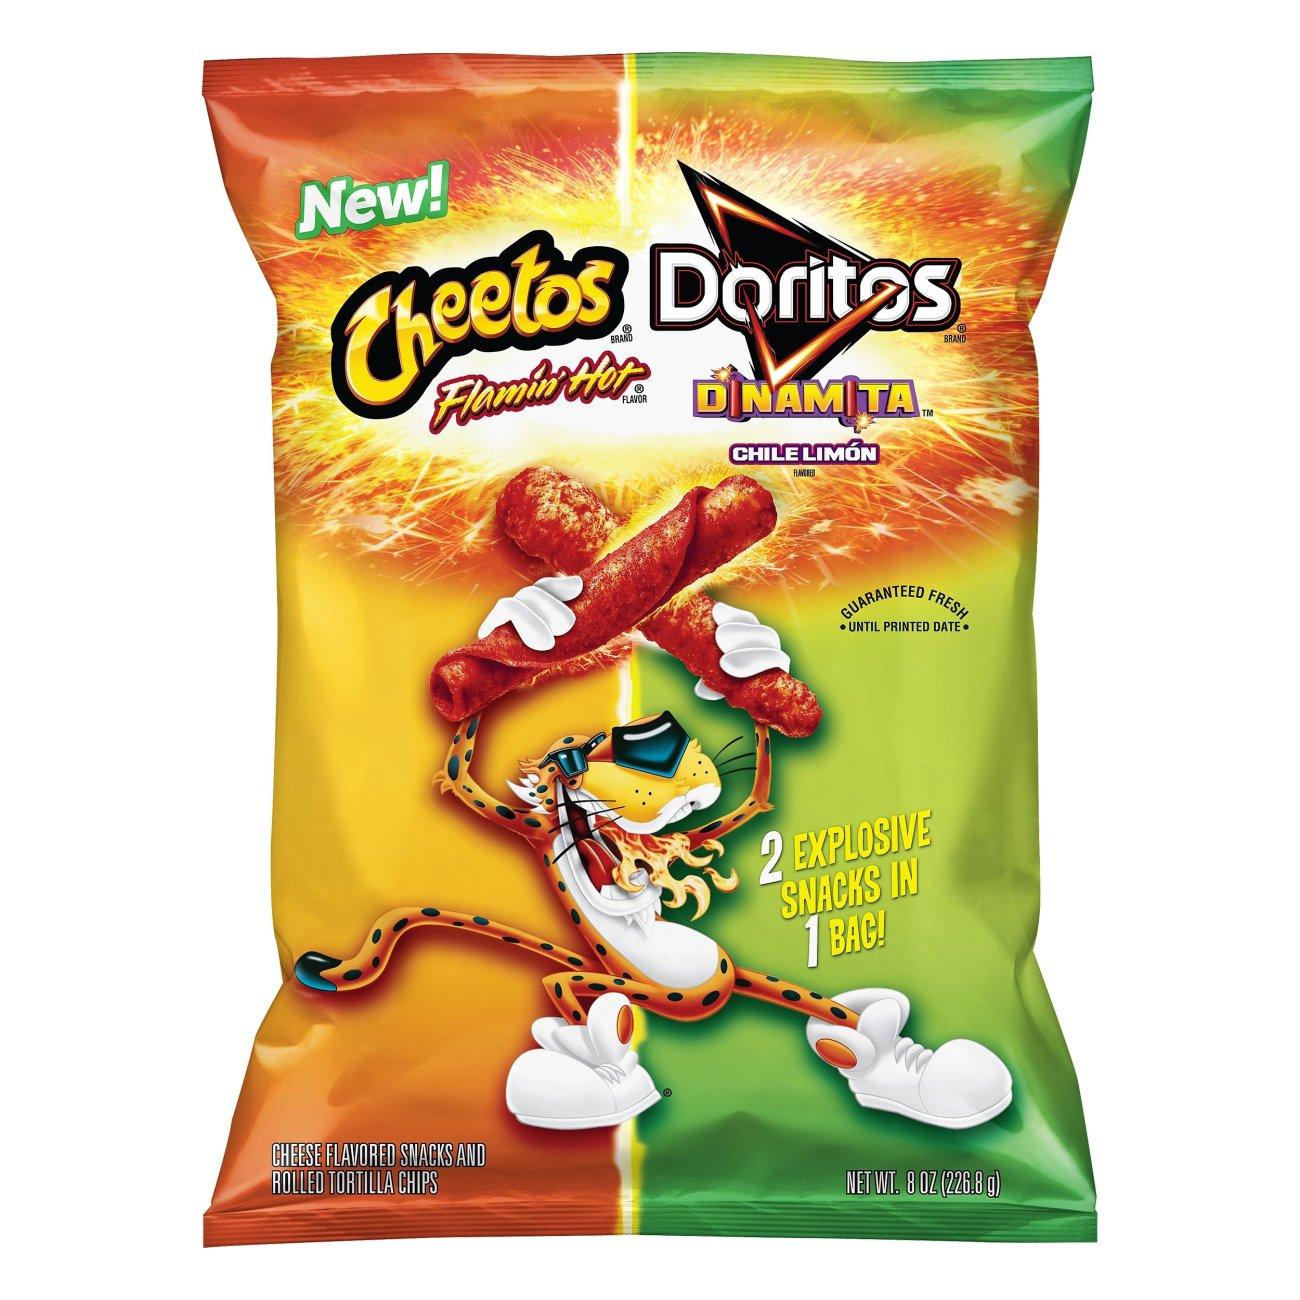 Cheetos Crunchy Flamin' Hot Cheese